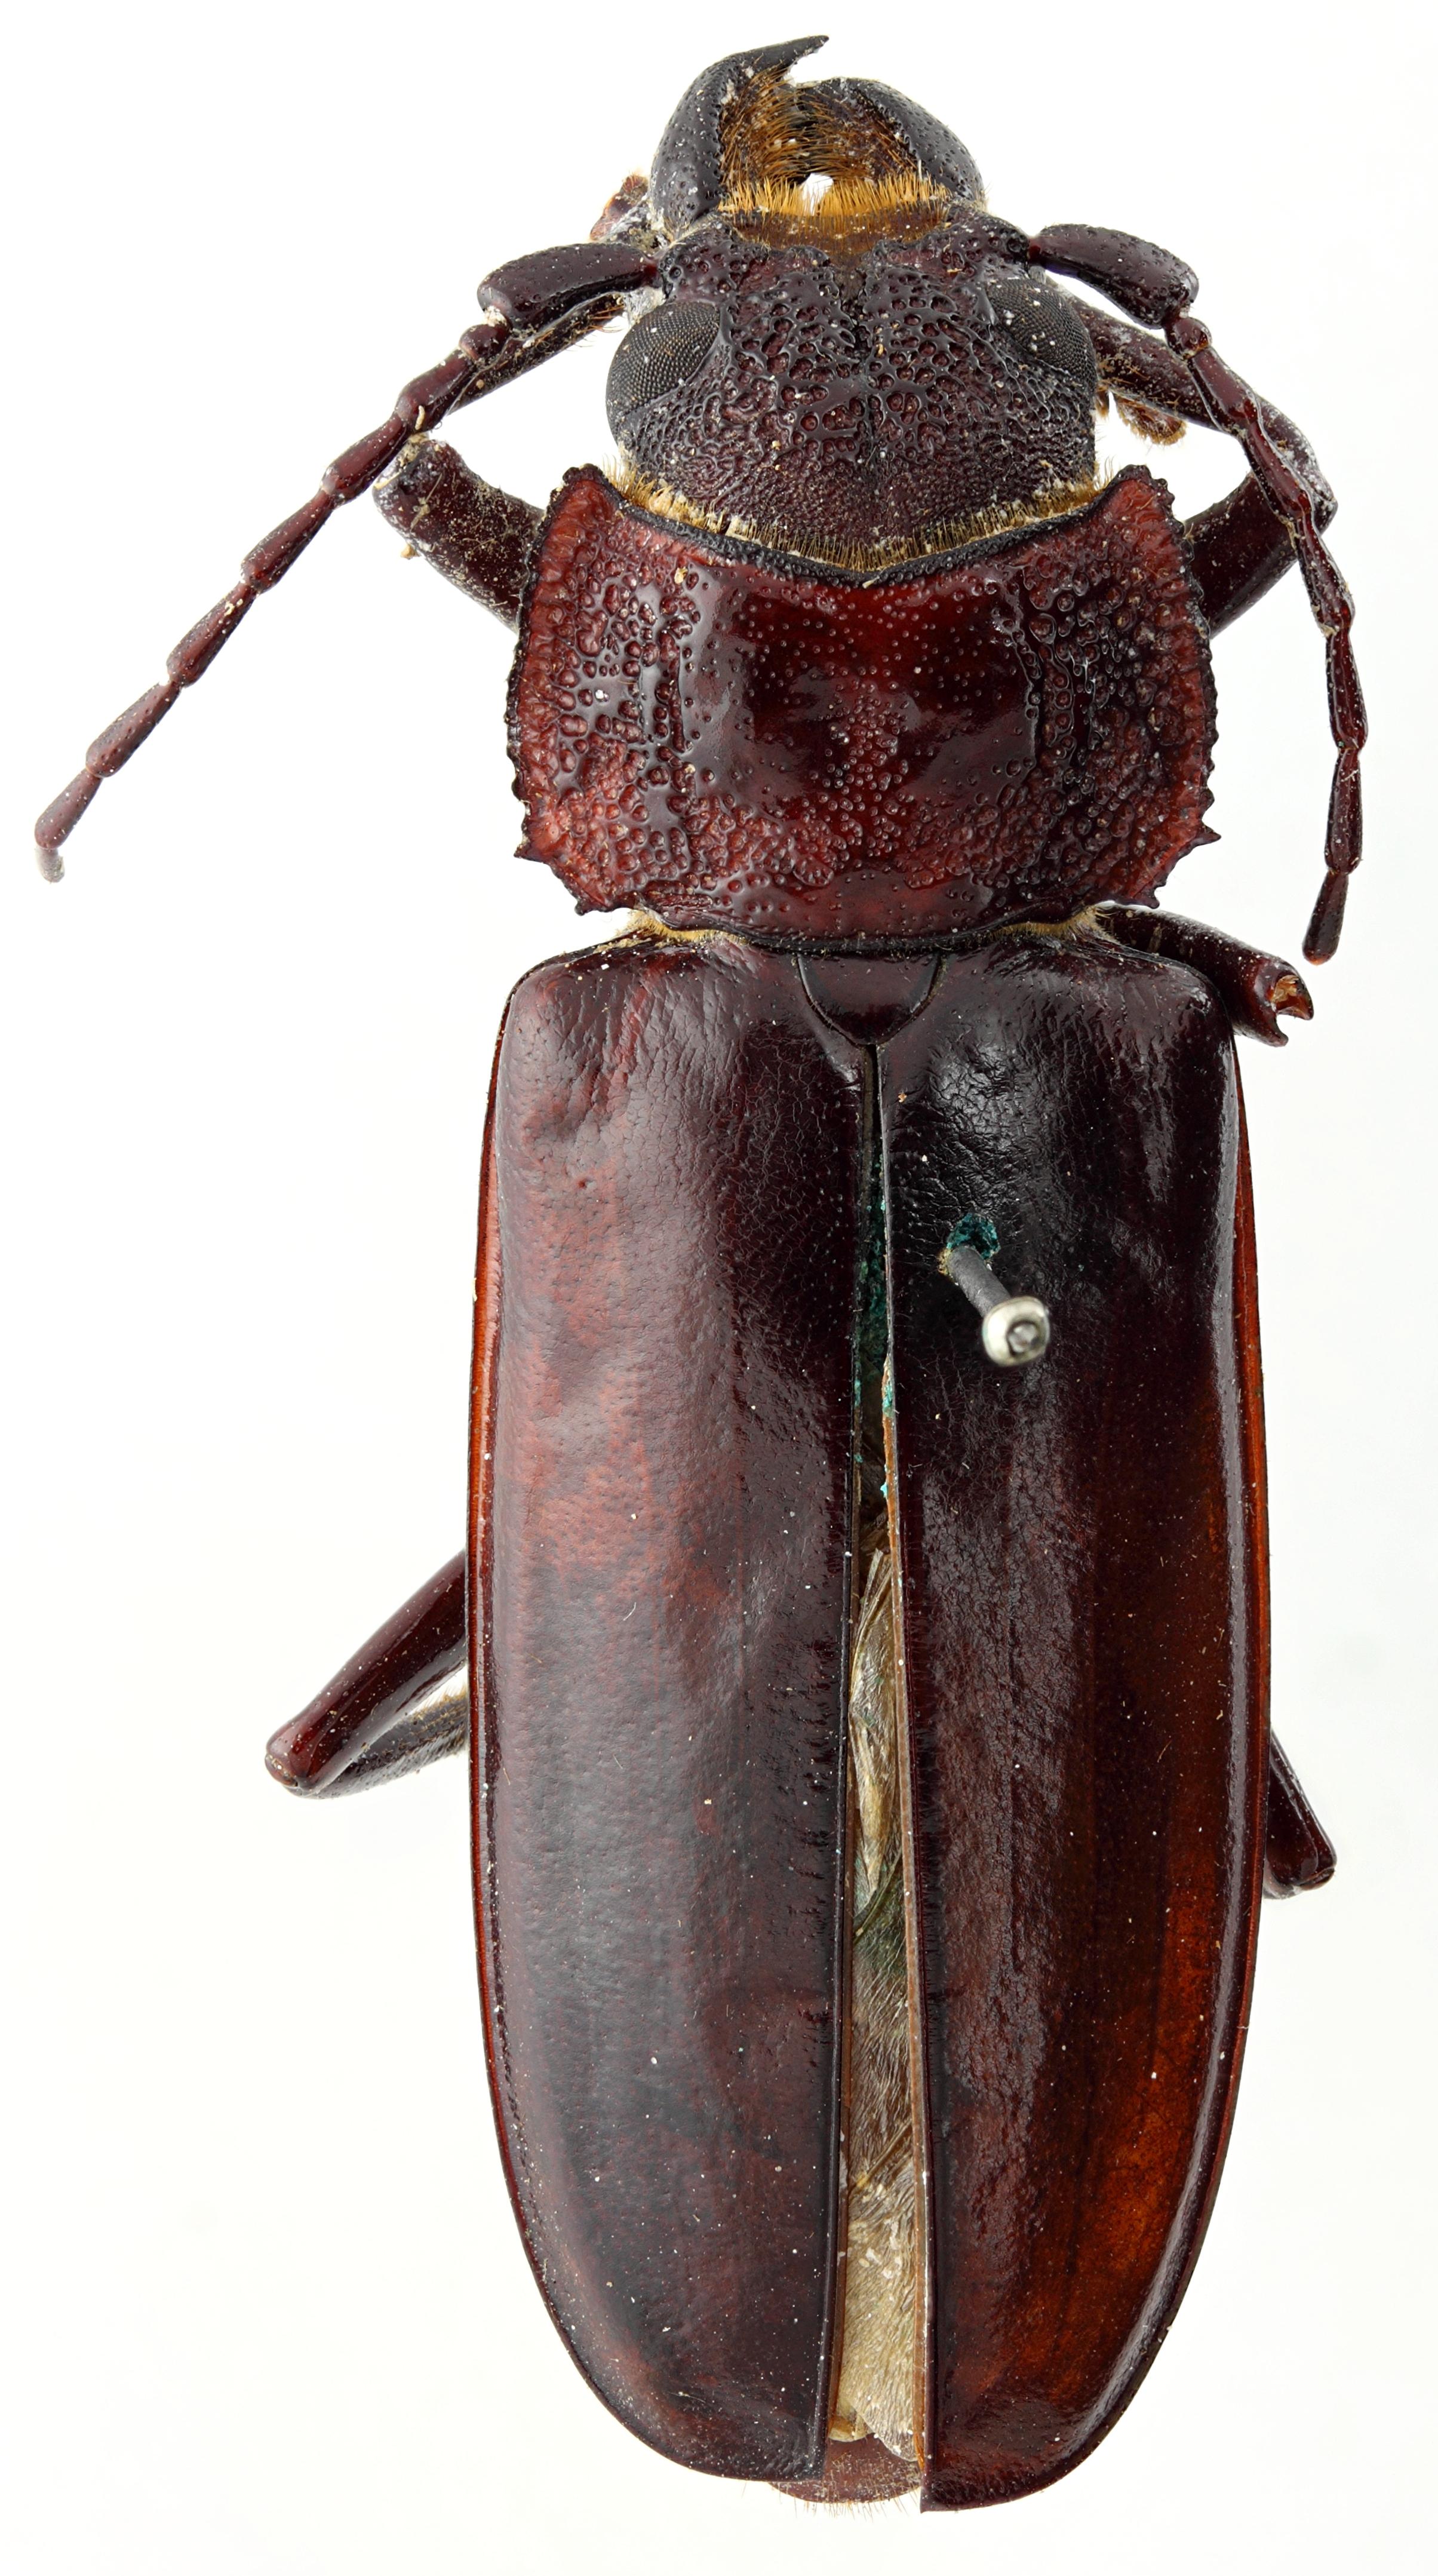 Stenodontes (Physopleurus) villardi 07 HP Cotype M 047 BRUS 201405.jpg